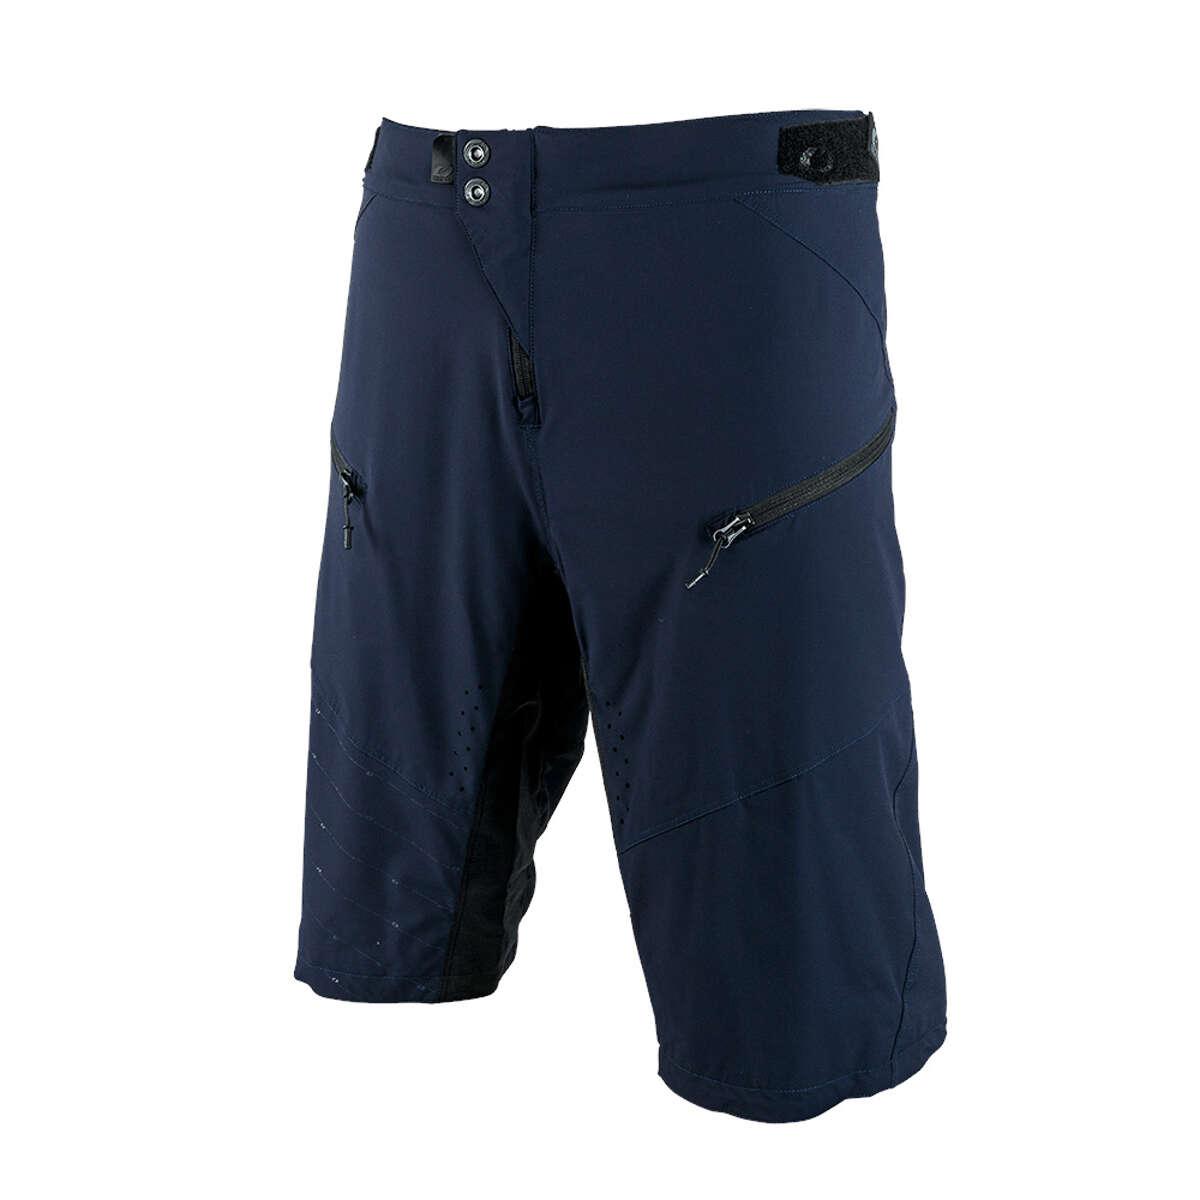 eacd54cd9 O'Neal Freeride Shorts Pin It Dark Blue 2019   Maciag Offroad